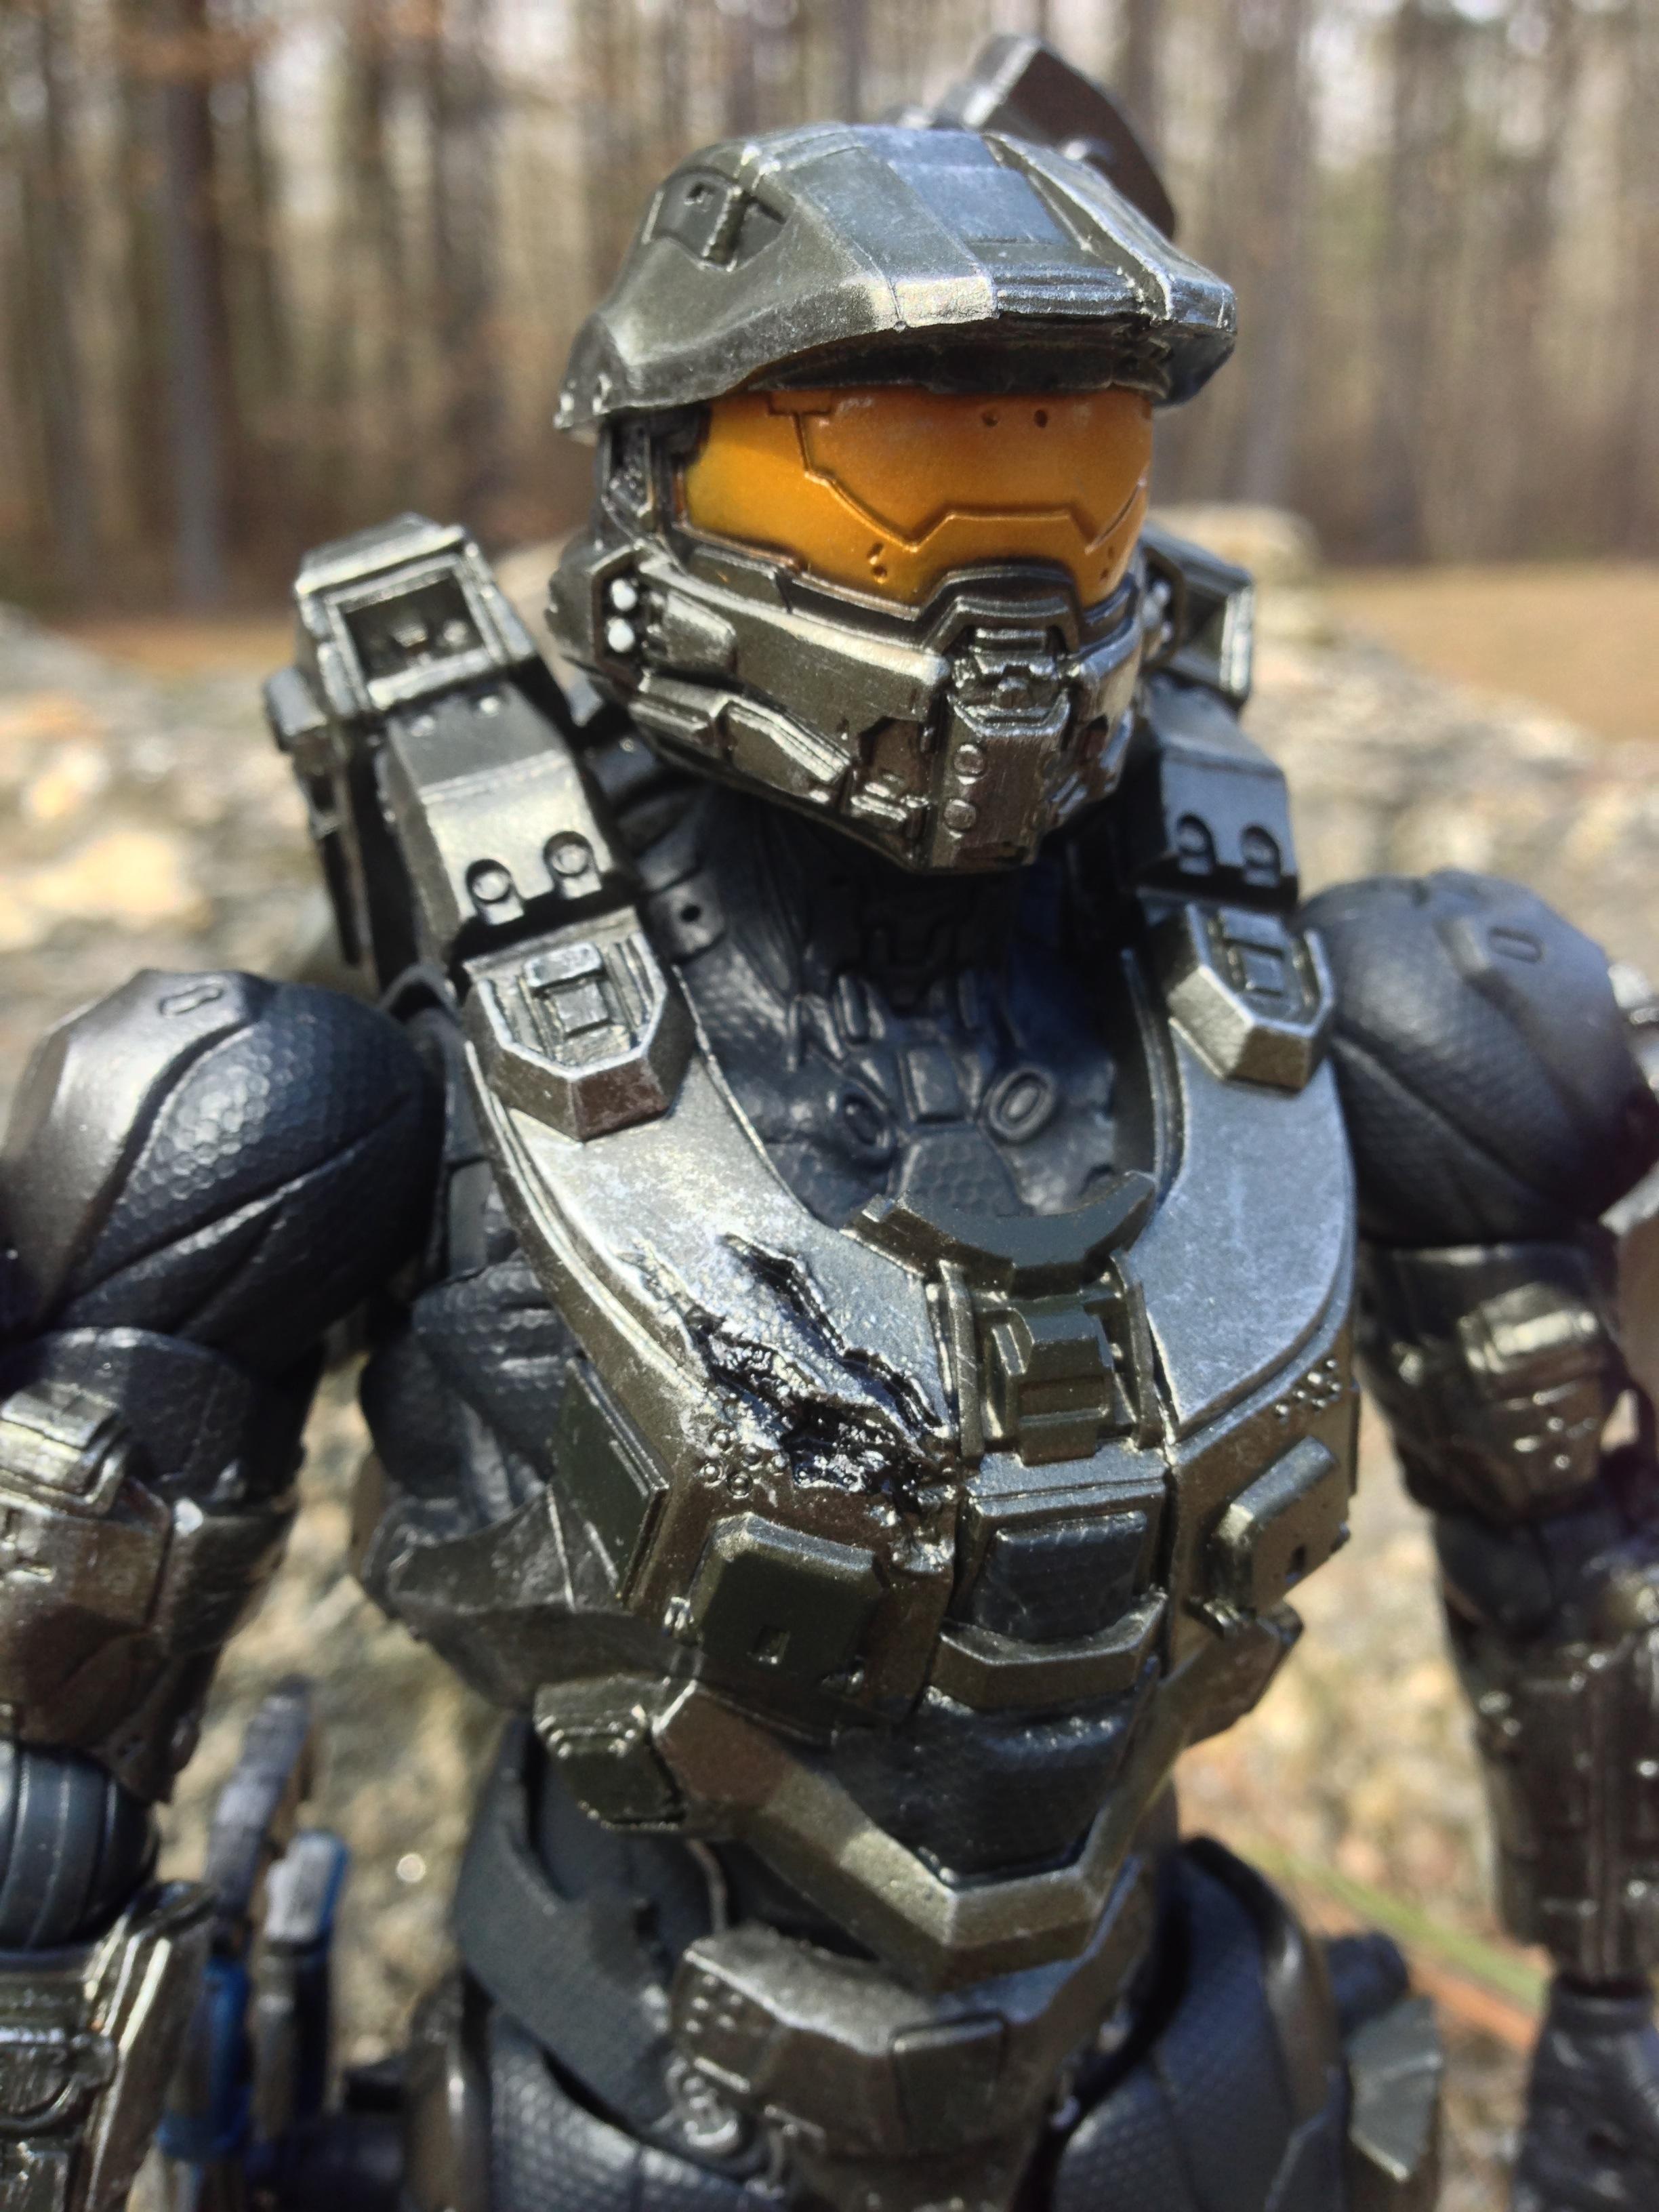 Mcfarlane Toys Halo 4 5′